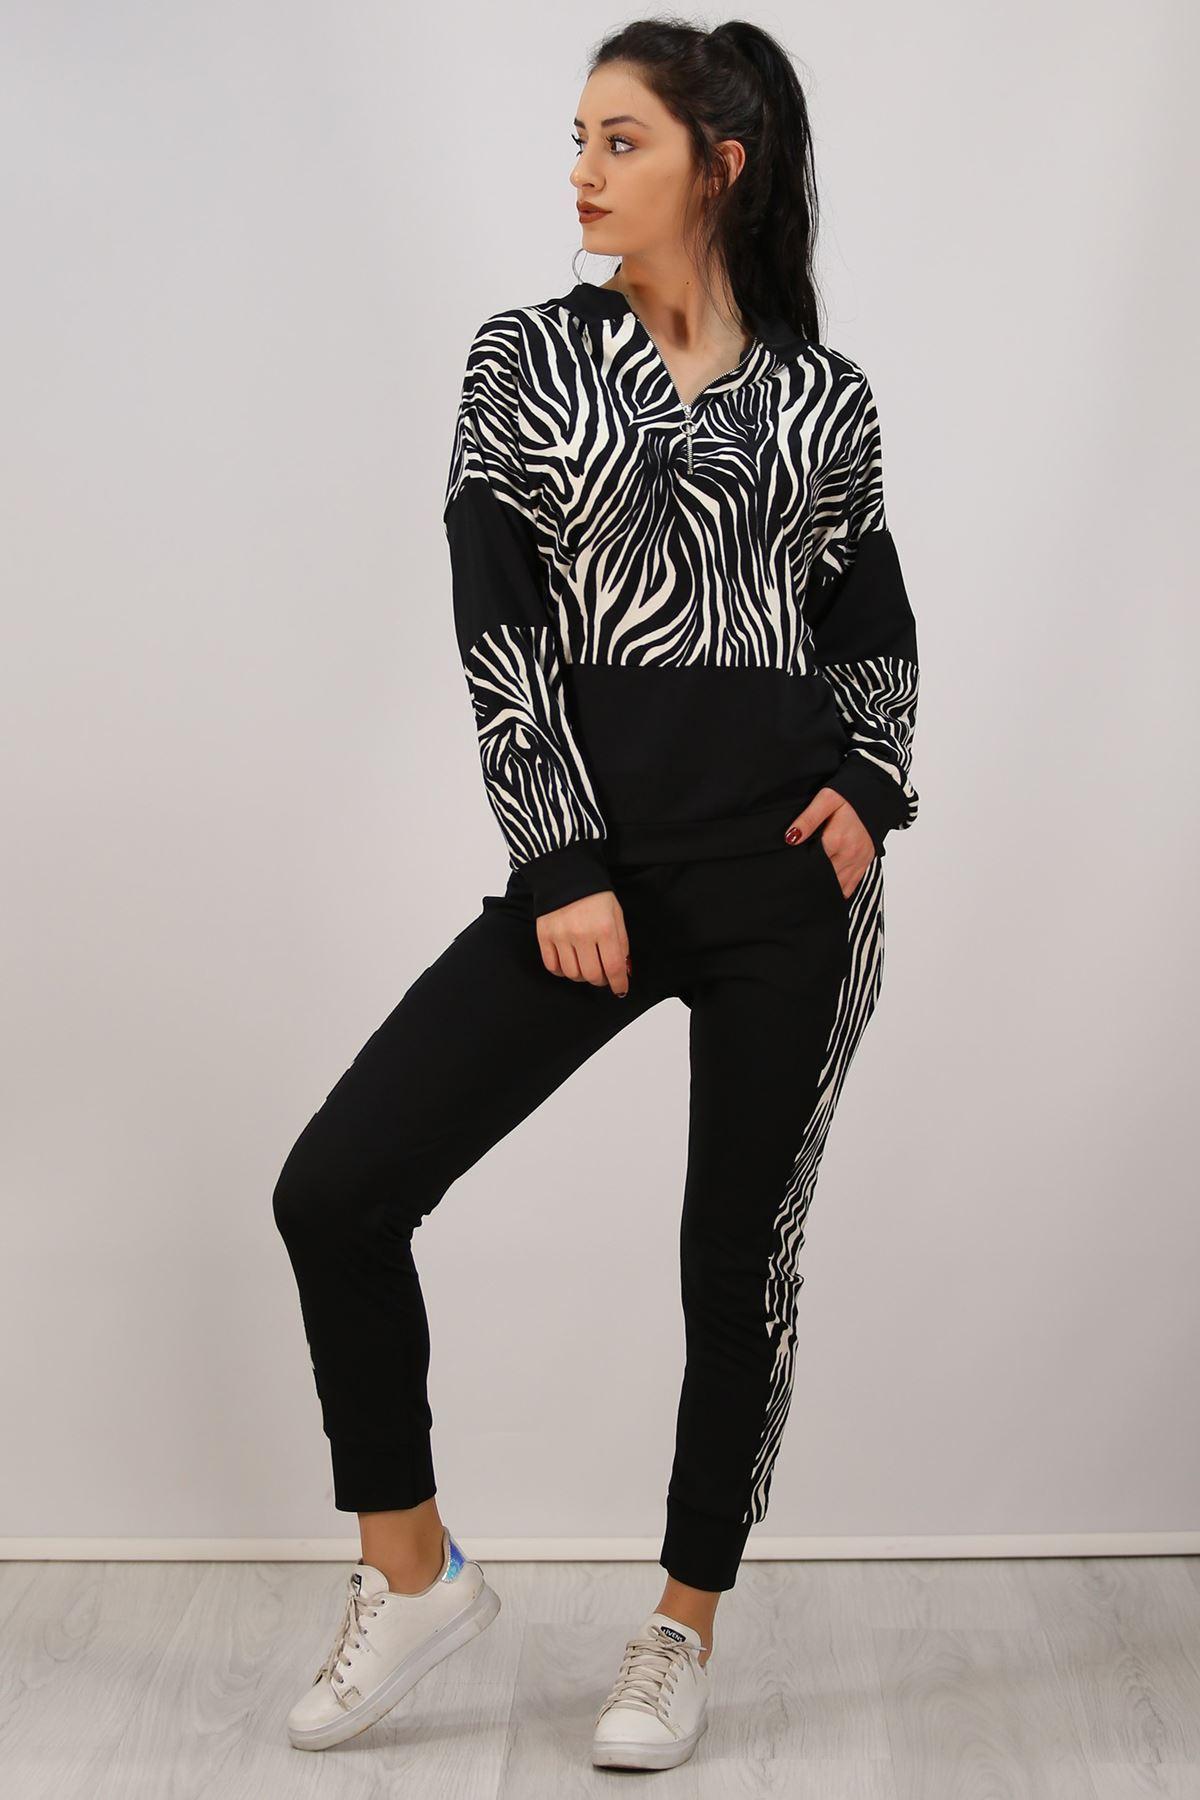 Mira Eşofman Takımı Zebra - 4805.1234.